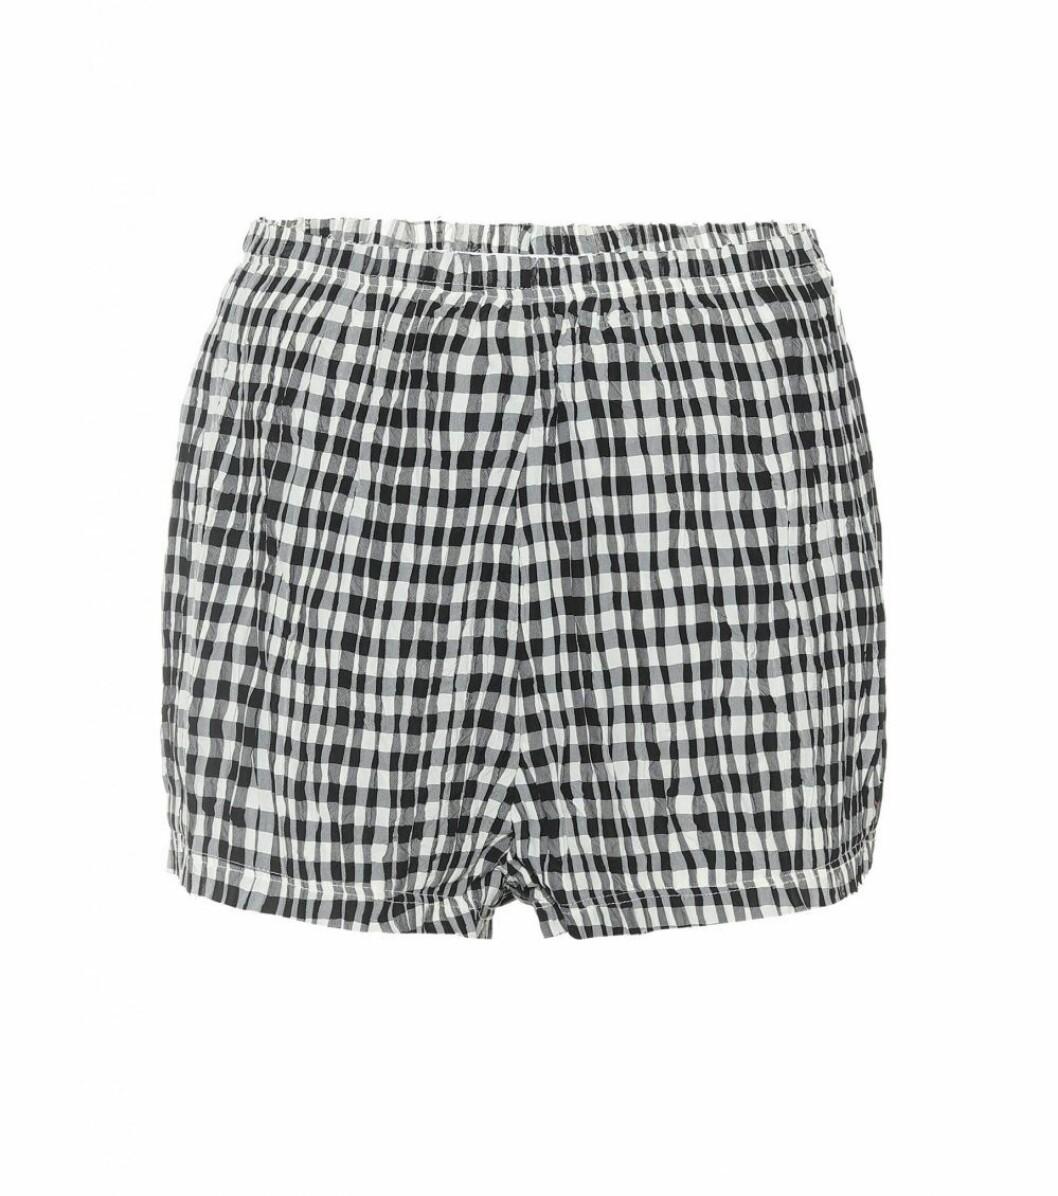 rutiga shorts från Khaite x Mytheresa.